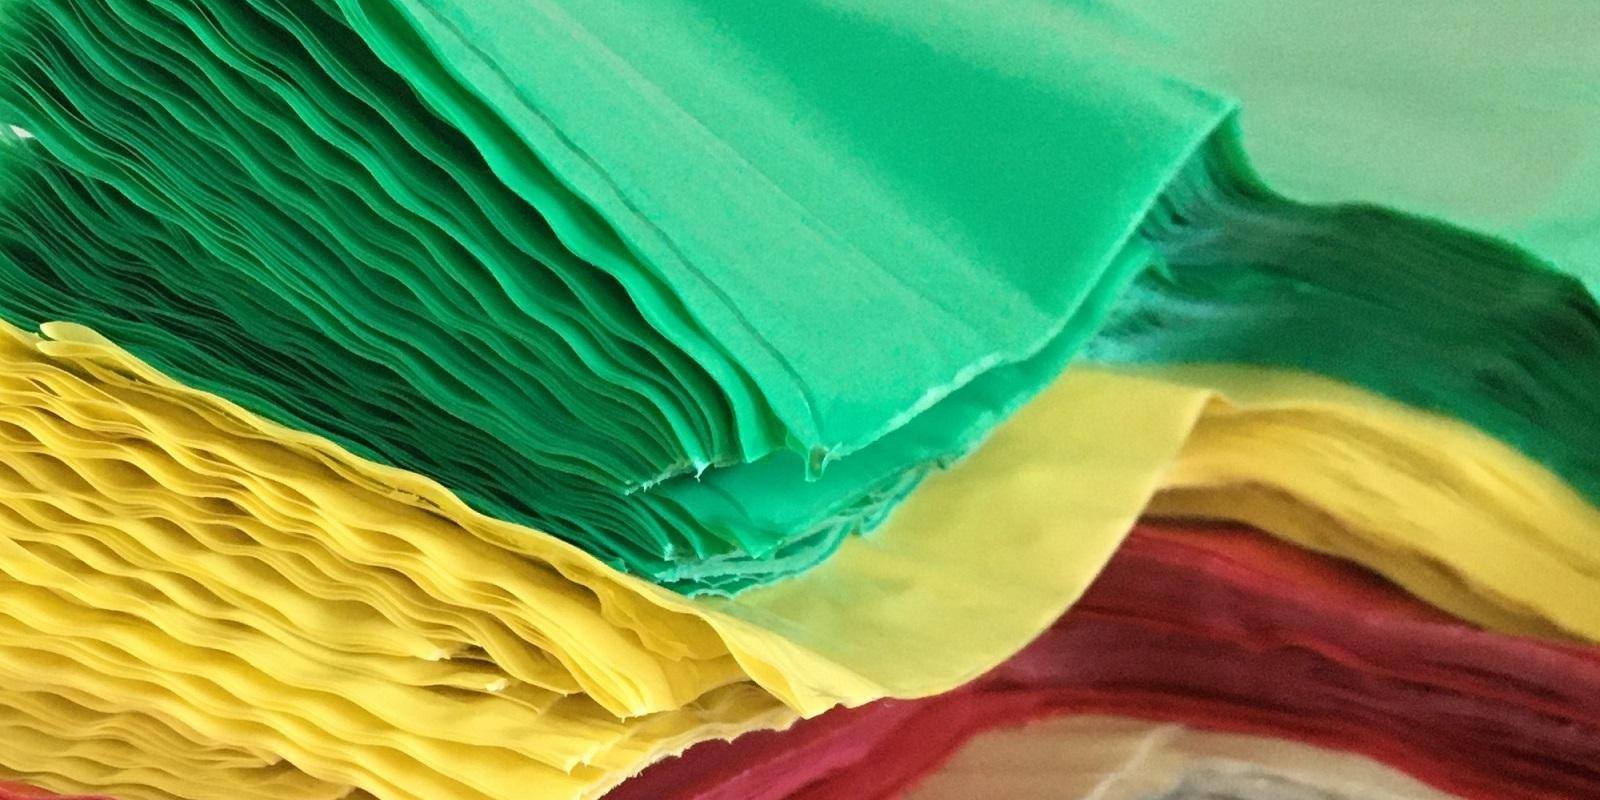 Loja online de sacos plásticos